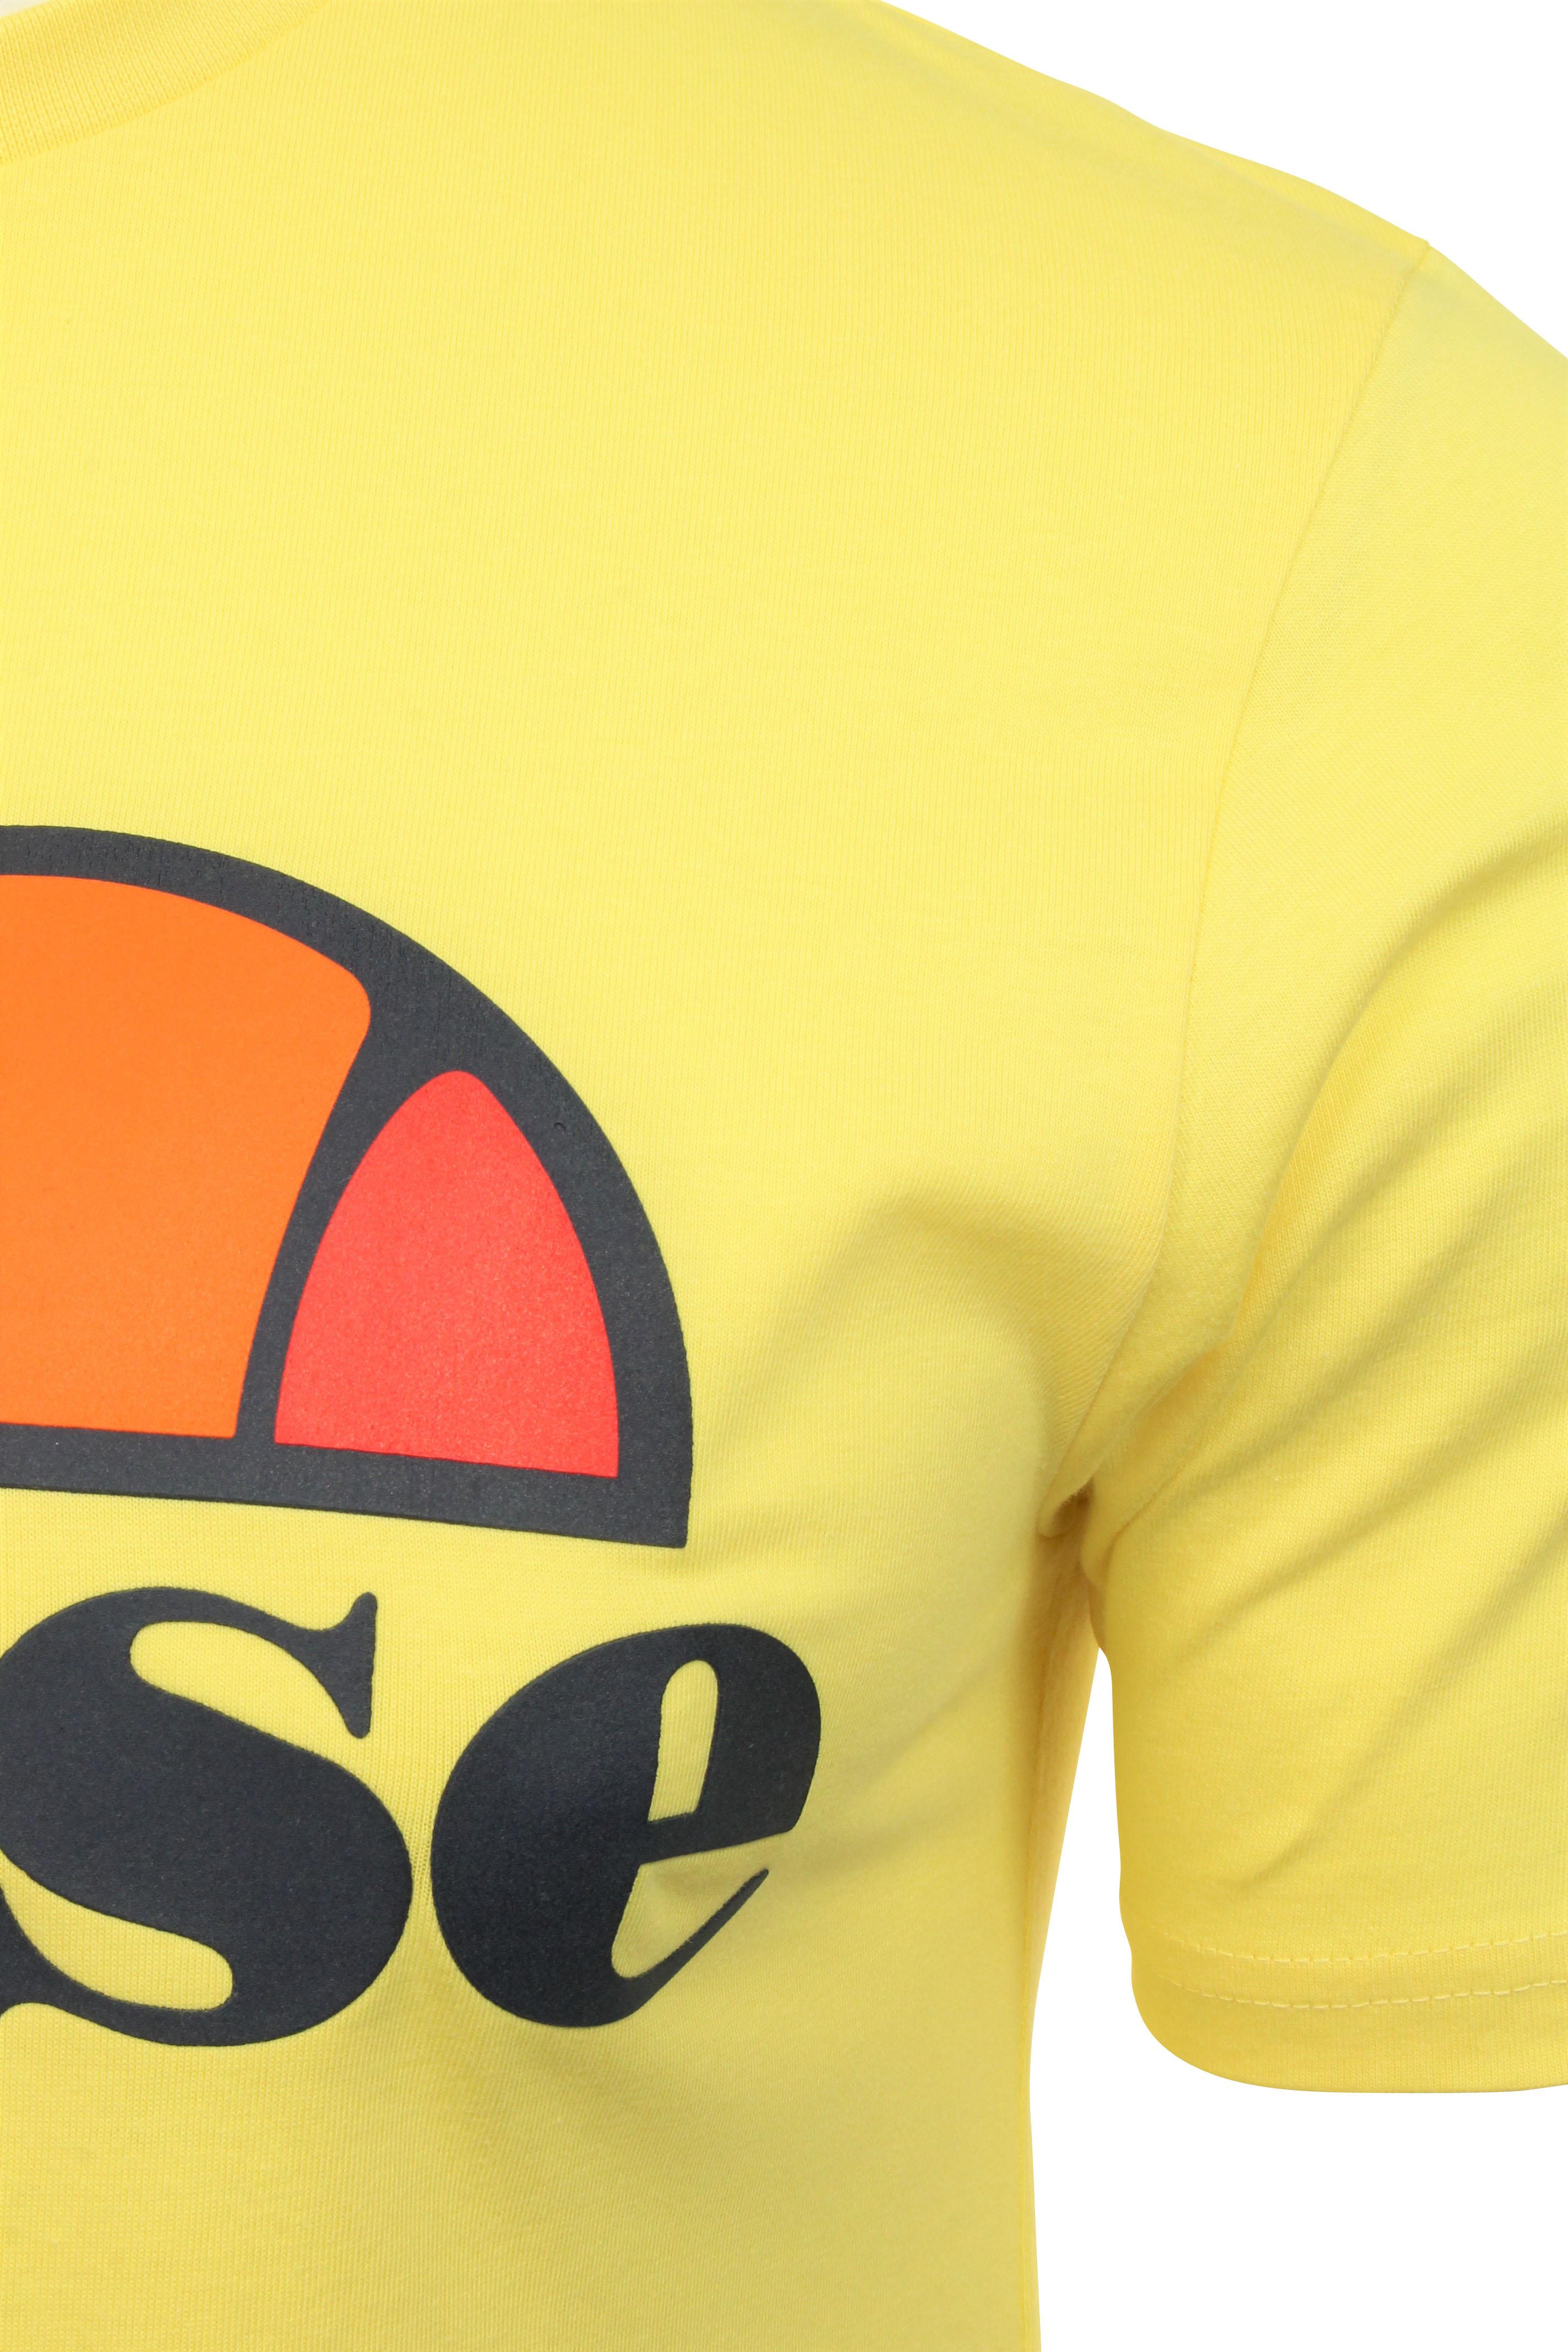 Mens-Ellesse-T-Shirt-039-Prado-039-Short-Sleeved thumbnail 17